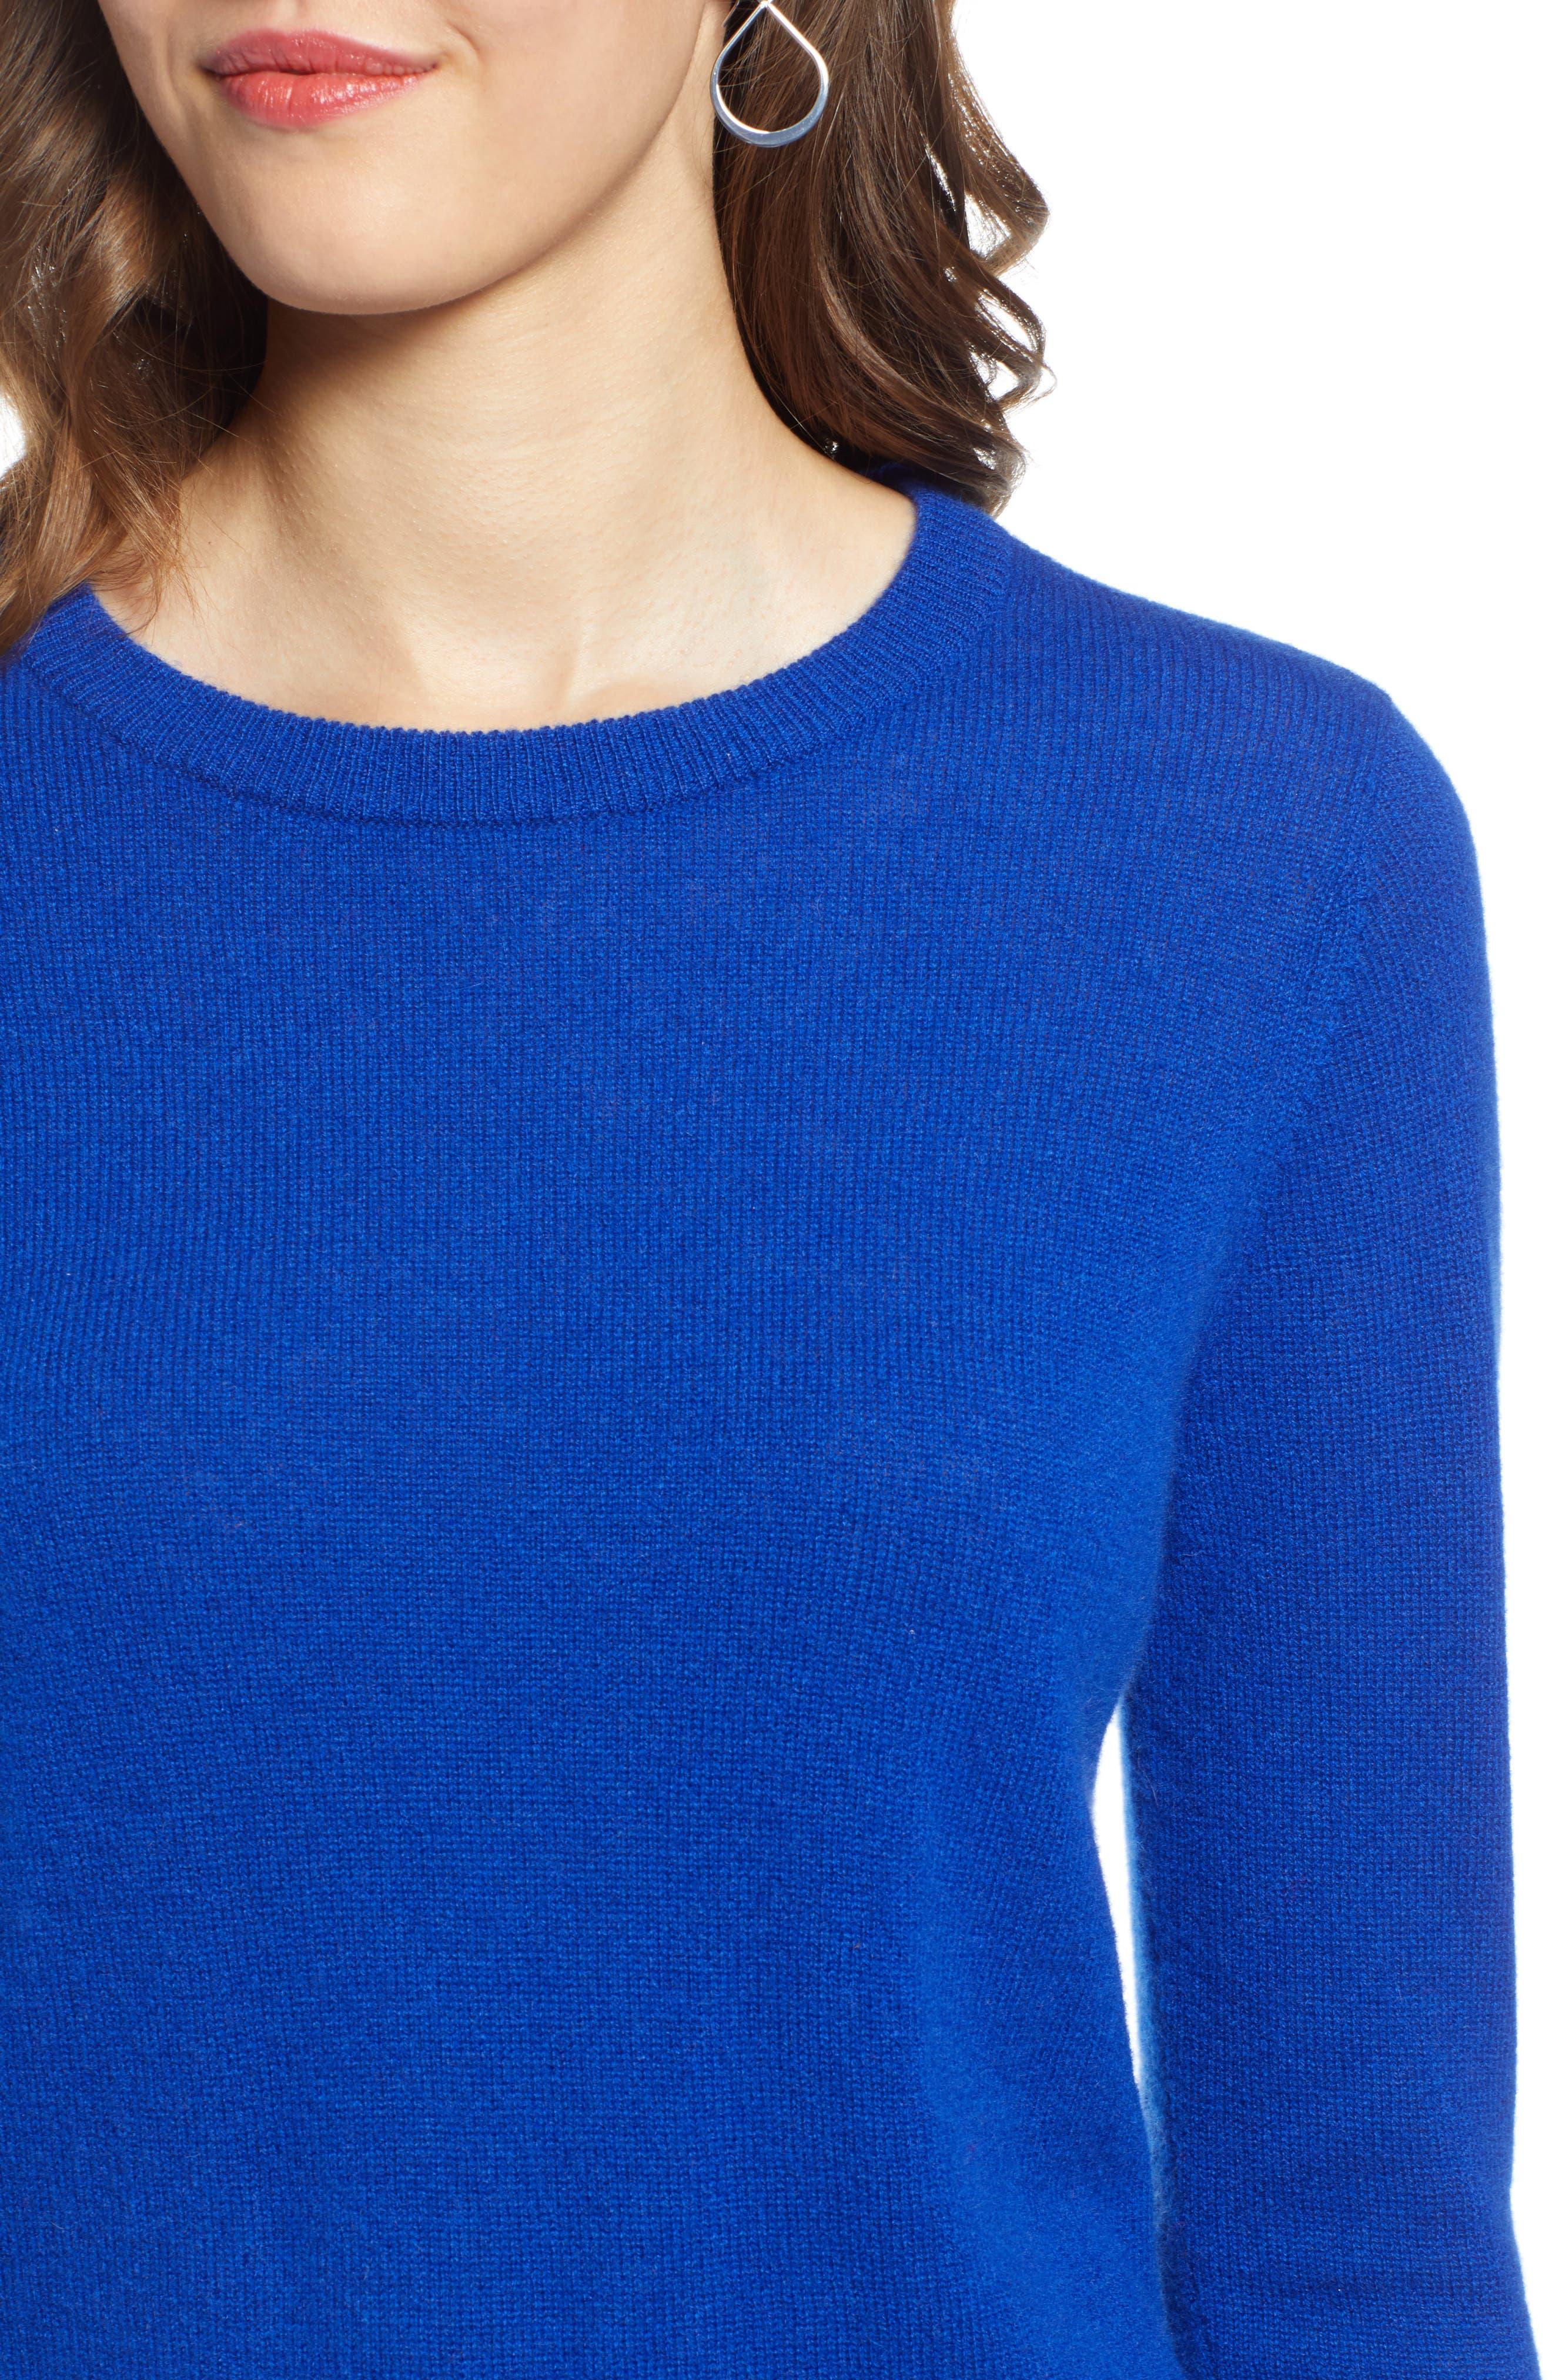 Crewneck Cashmere Sweater,                             Alternate thumbnail 4, color,                             BLUE MAZARINE